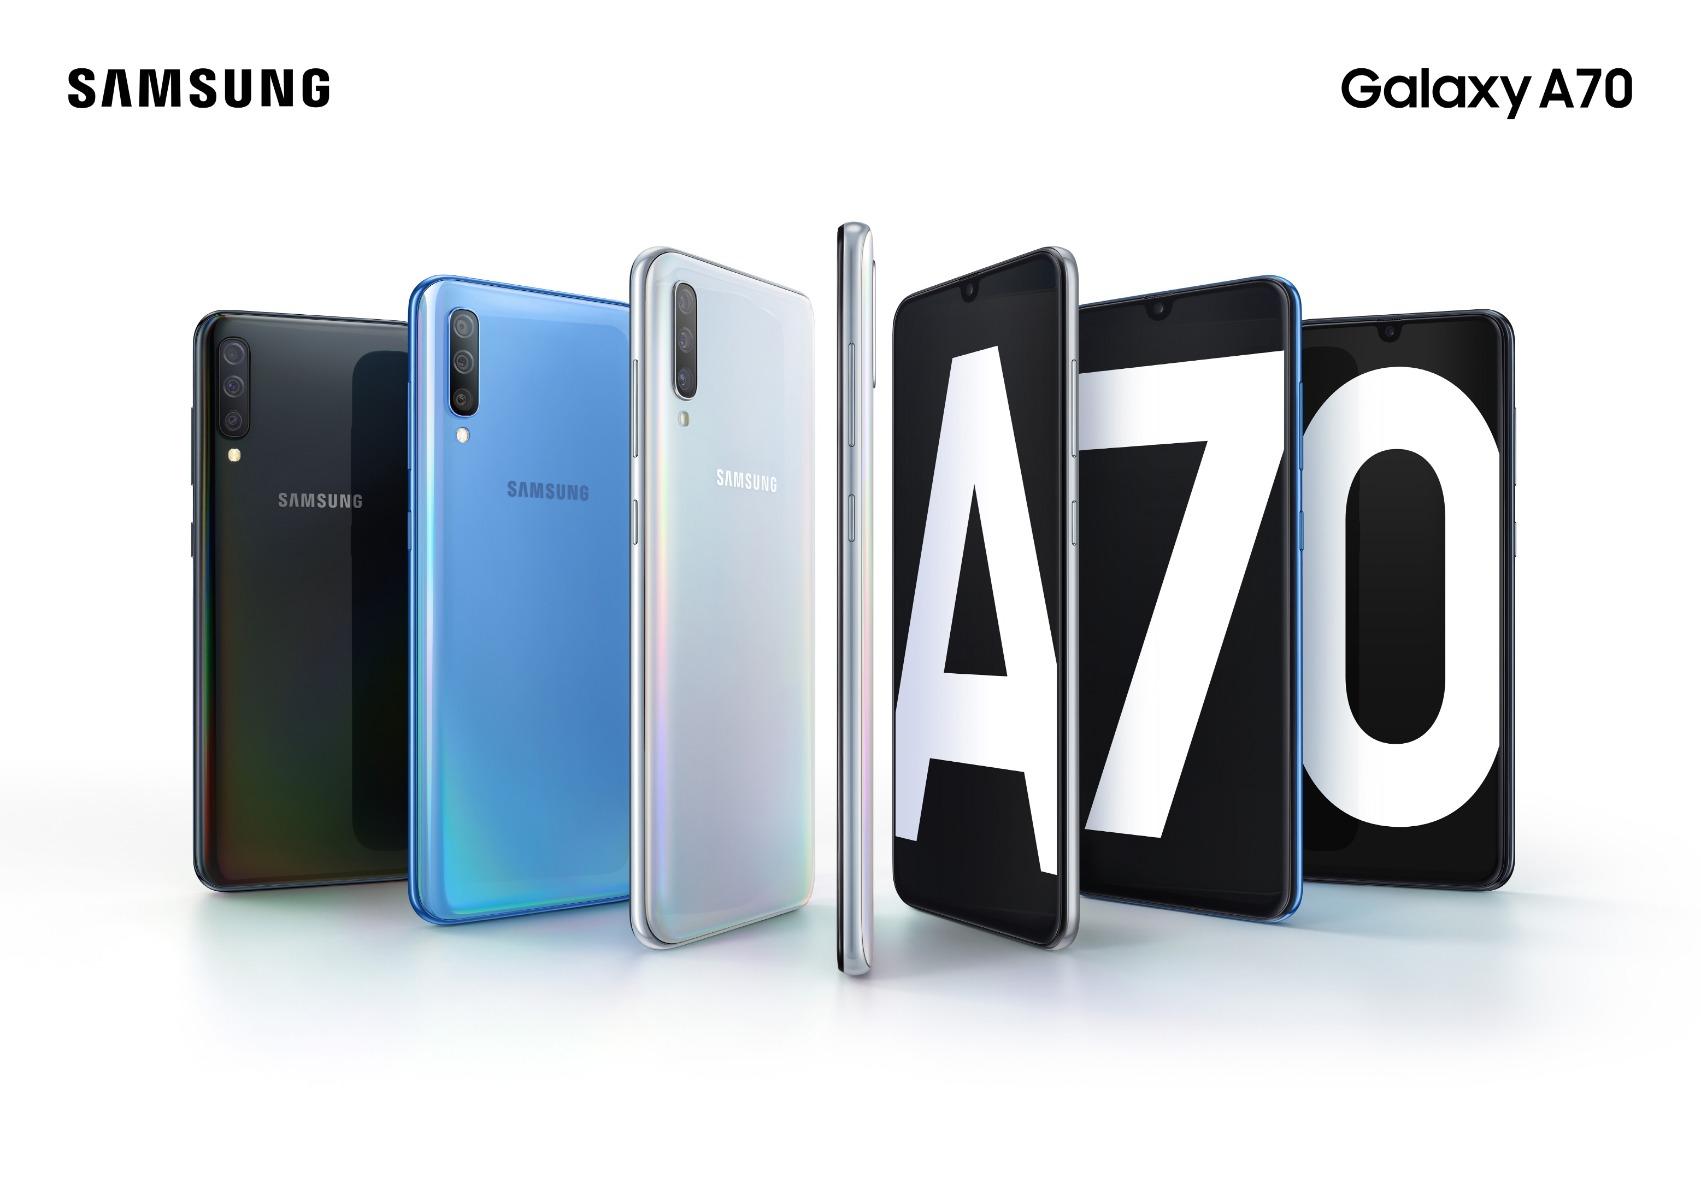 Jual Samsung Galaxy A70 6GB 128GB Plazakamera Surabaya Jakarta 1